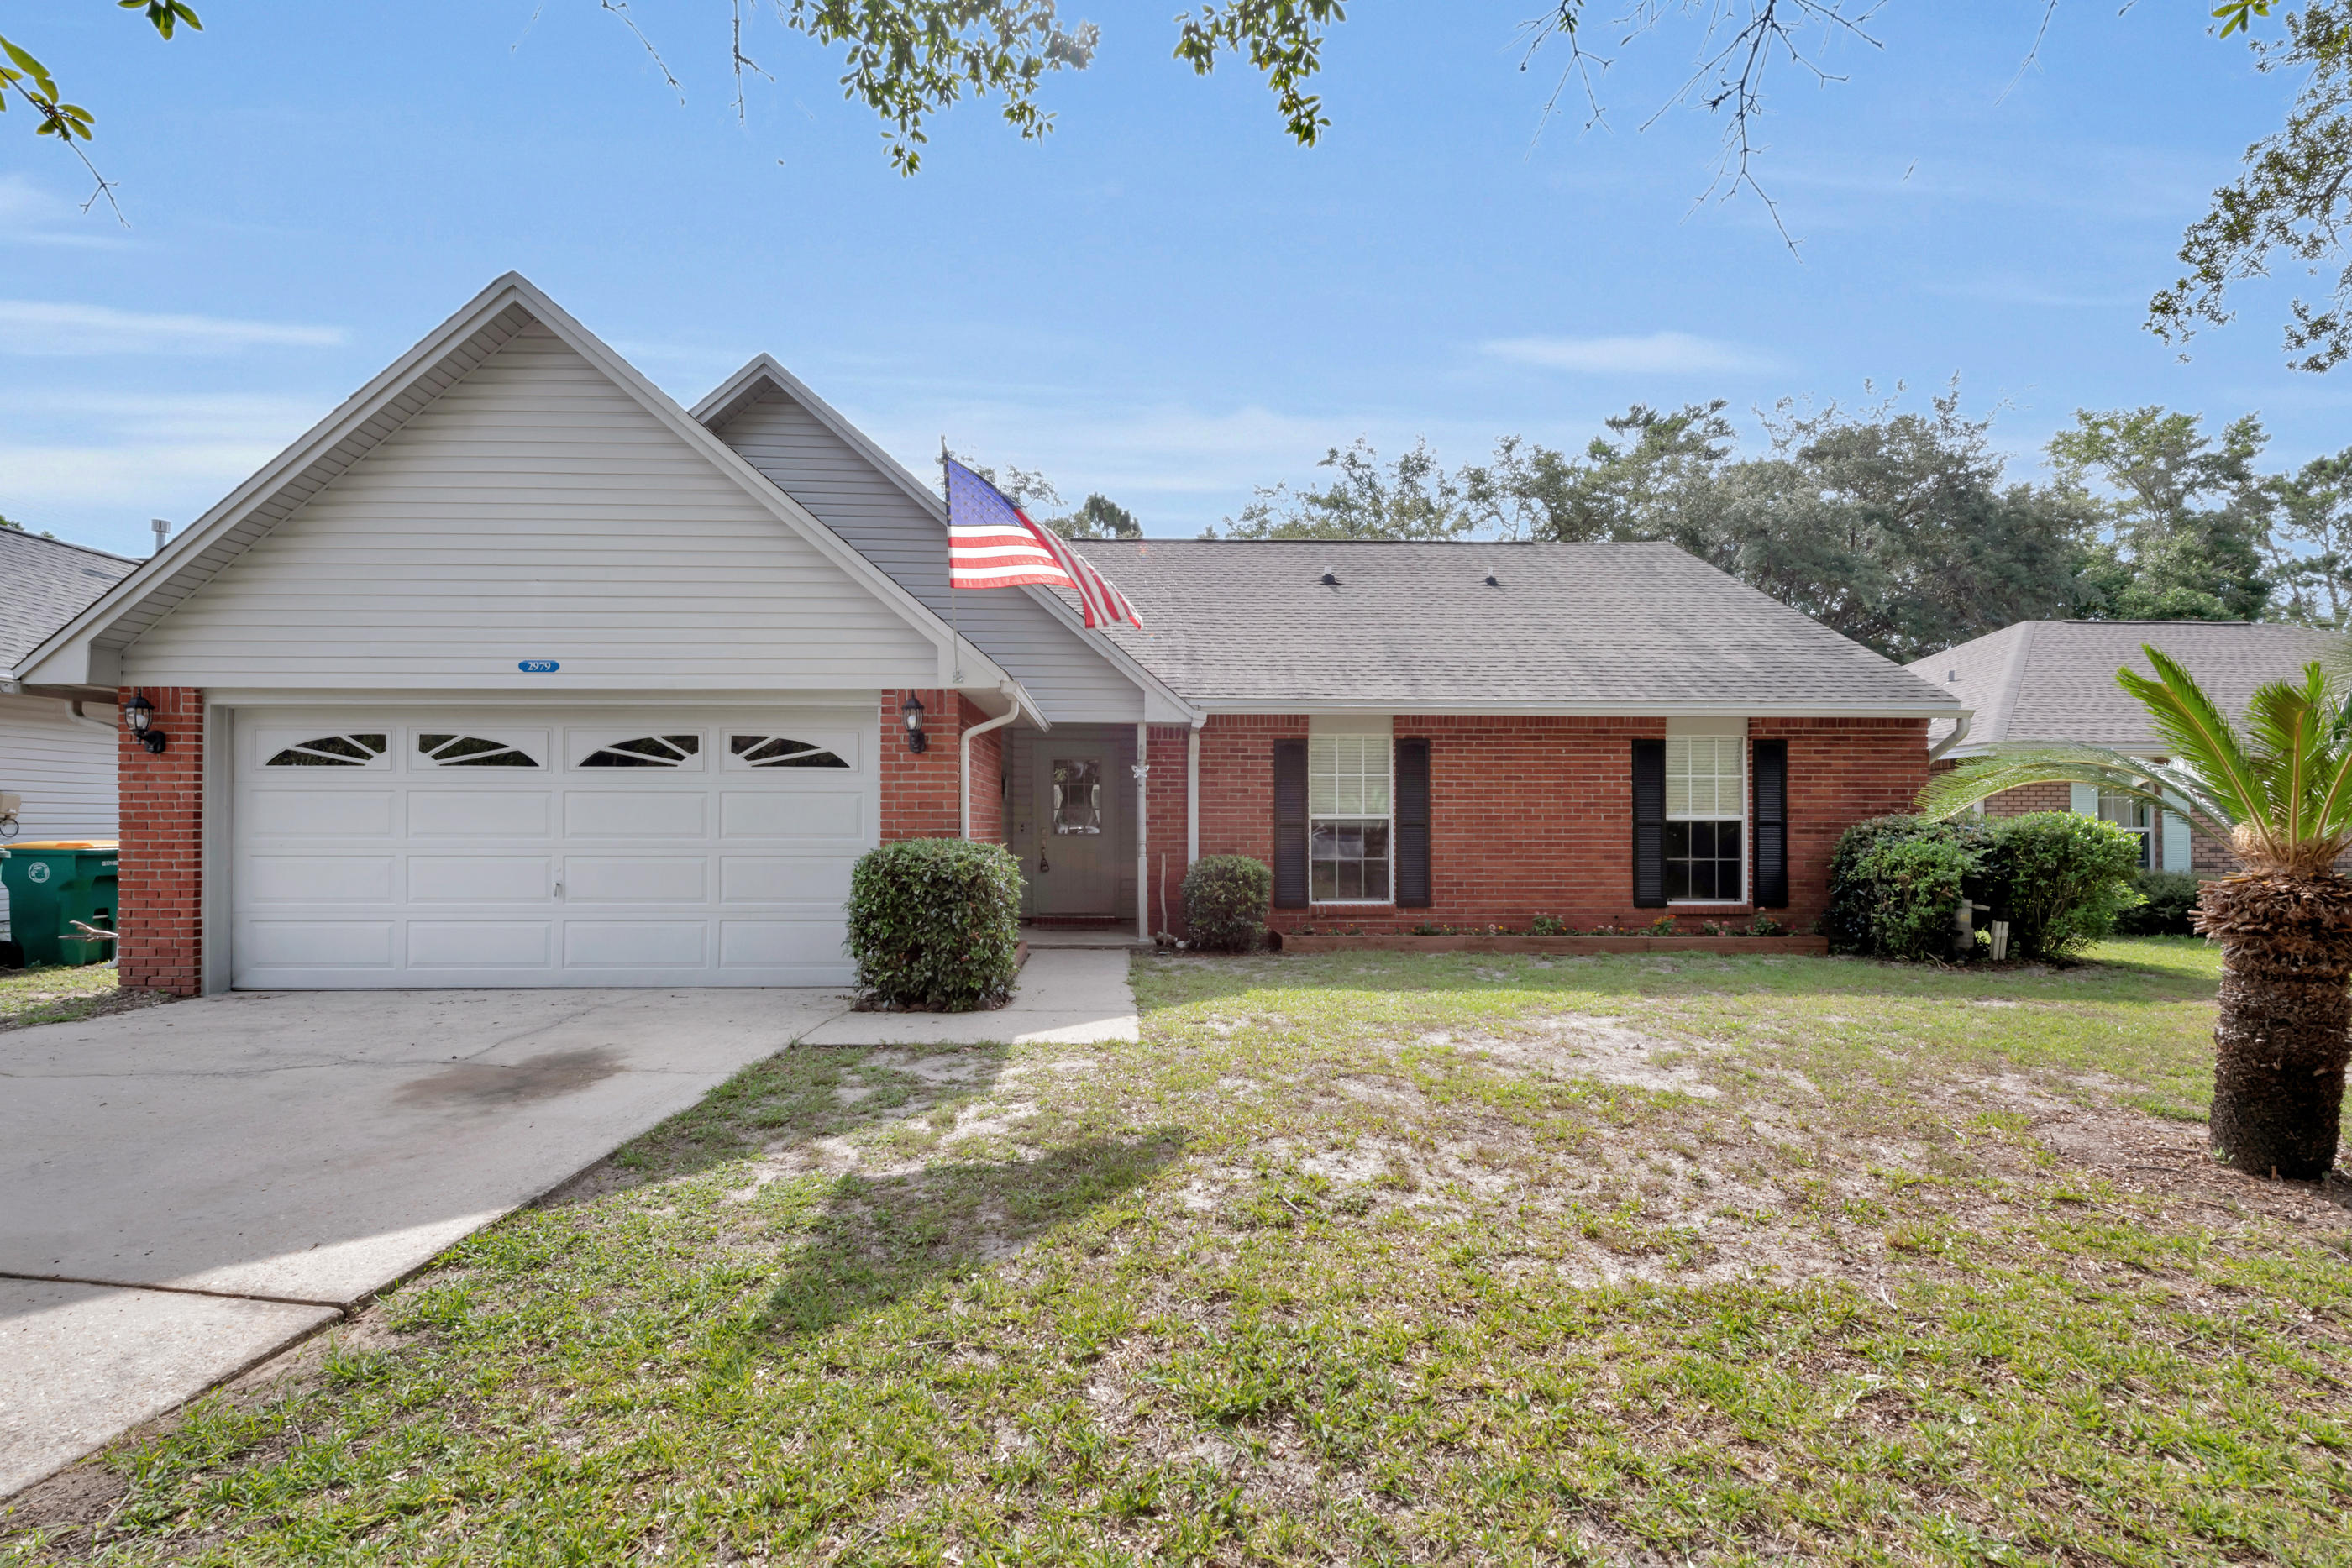 2979  Blue Pine Lane, Niceville in Okaloosa County, FL 32578 Home for Sale